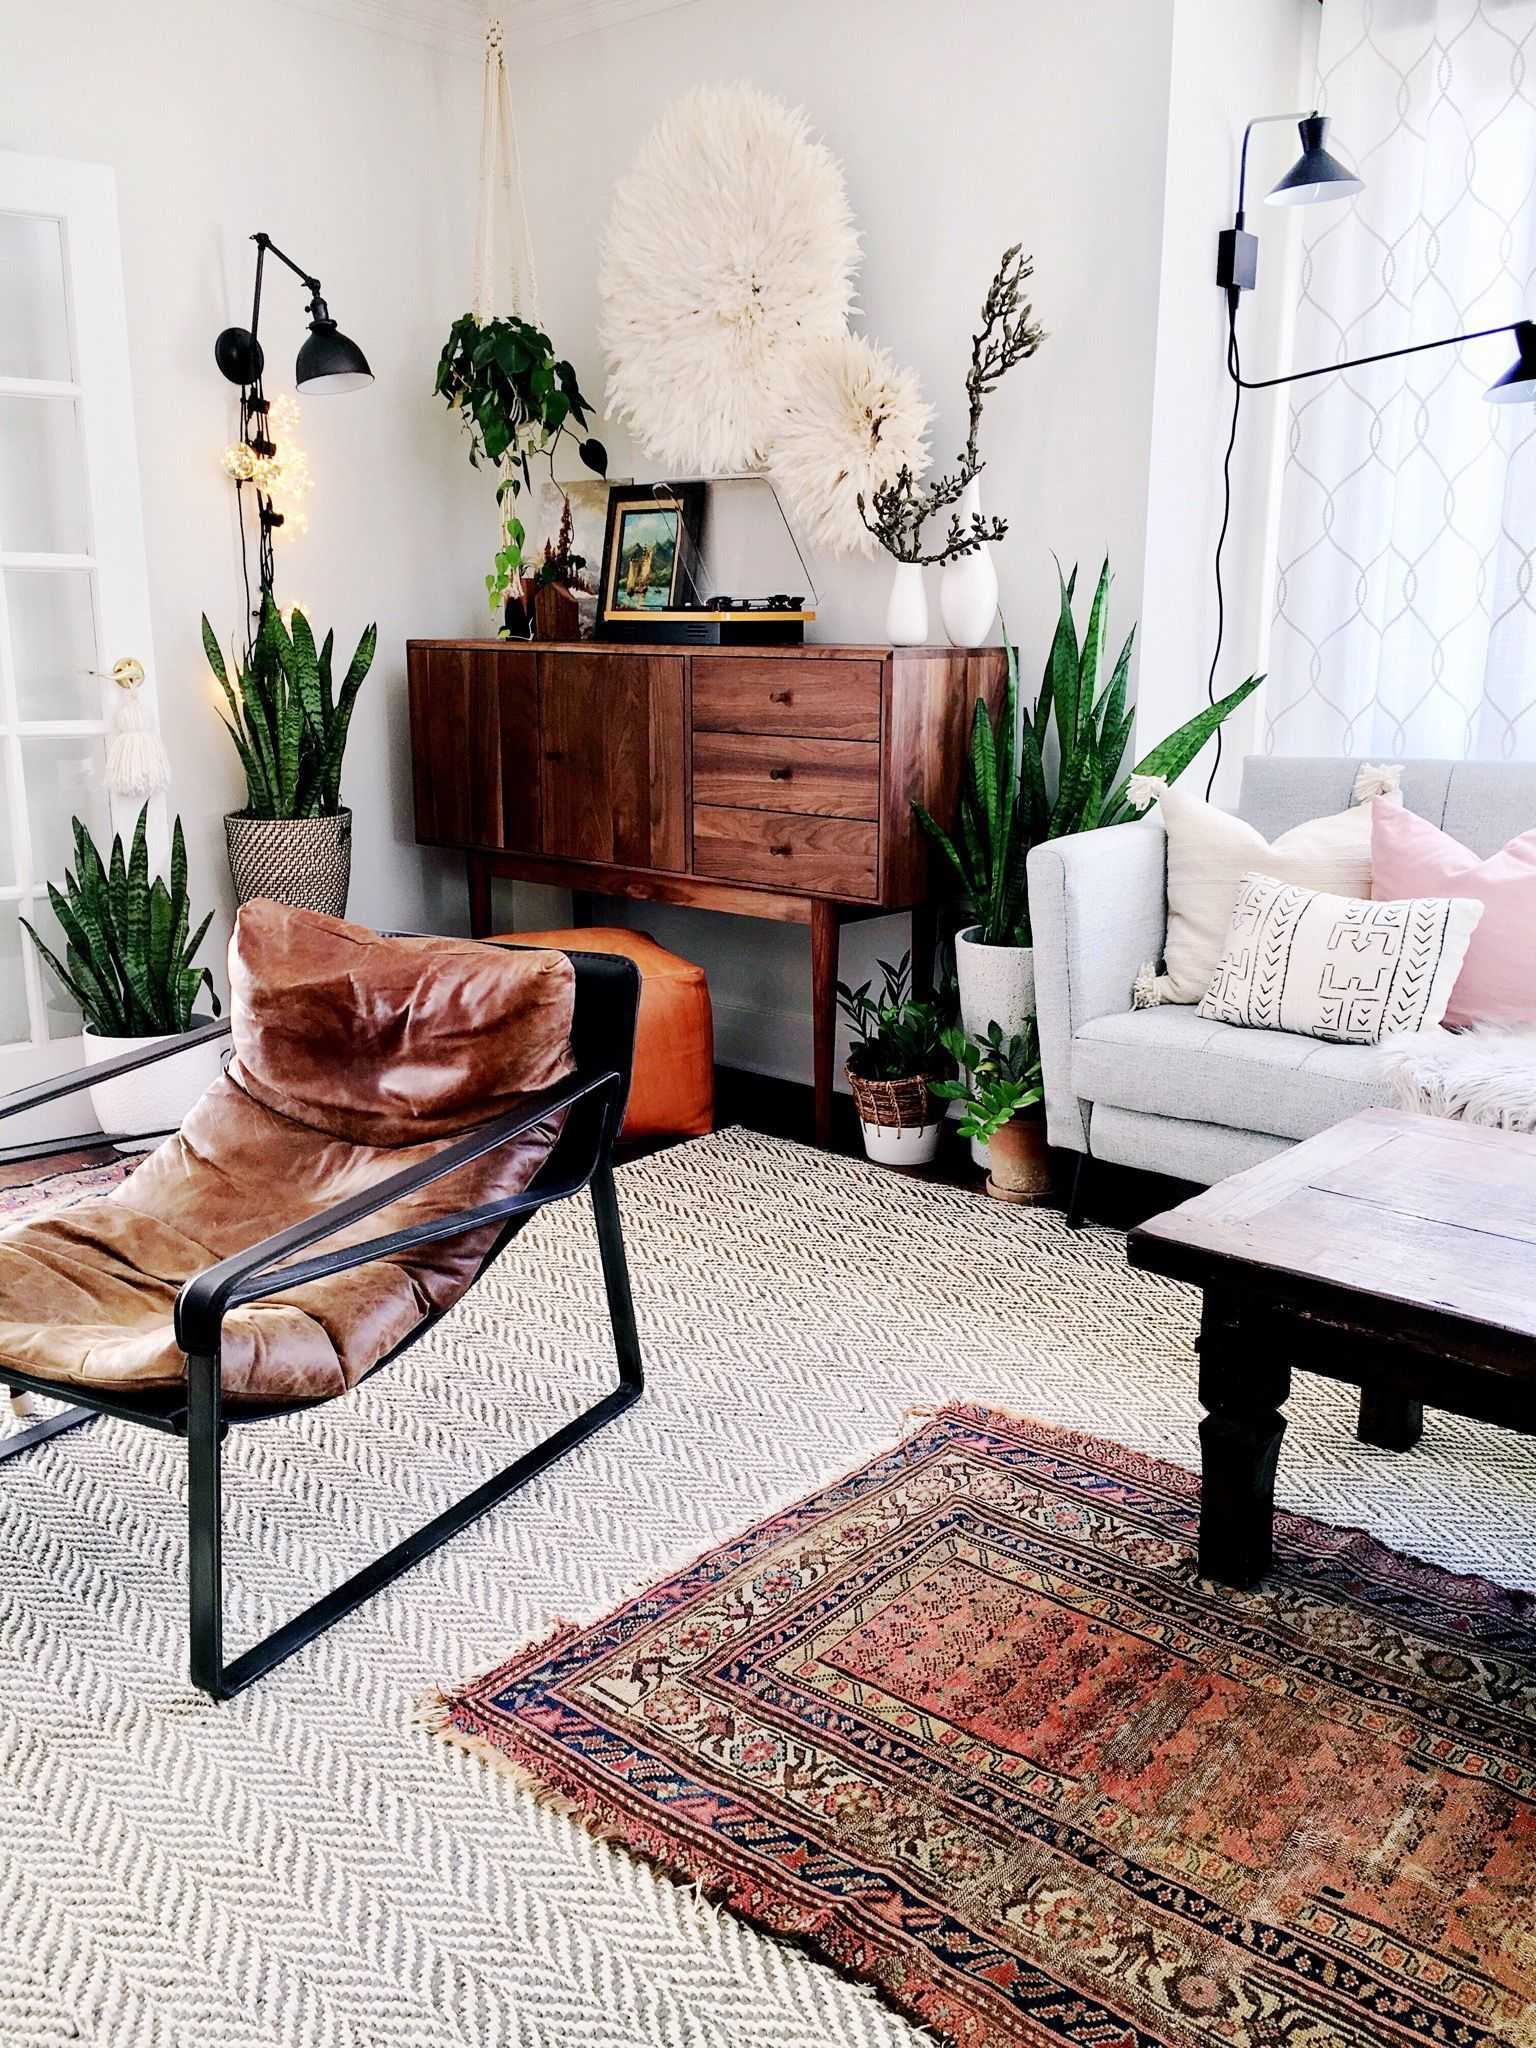 46 Awesome Nordic Boho Style Inspiration Home Interior Design